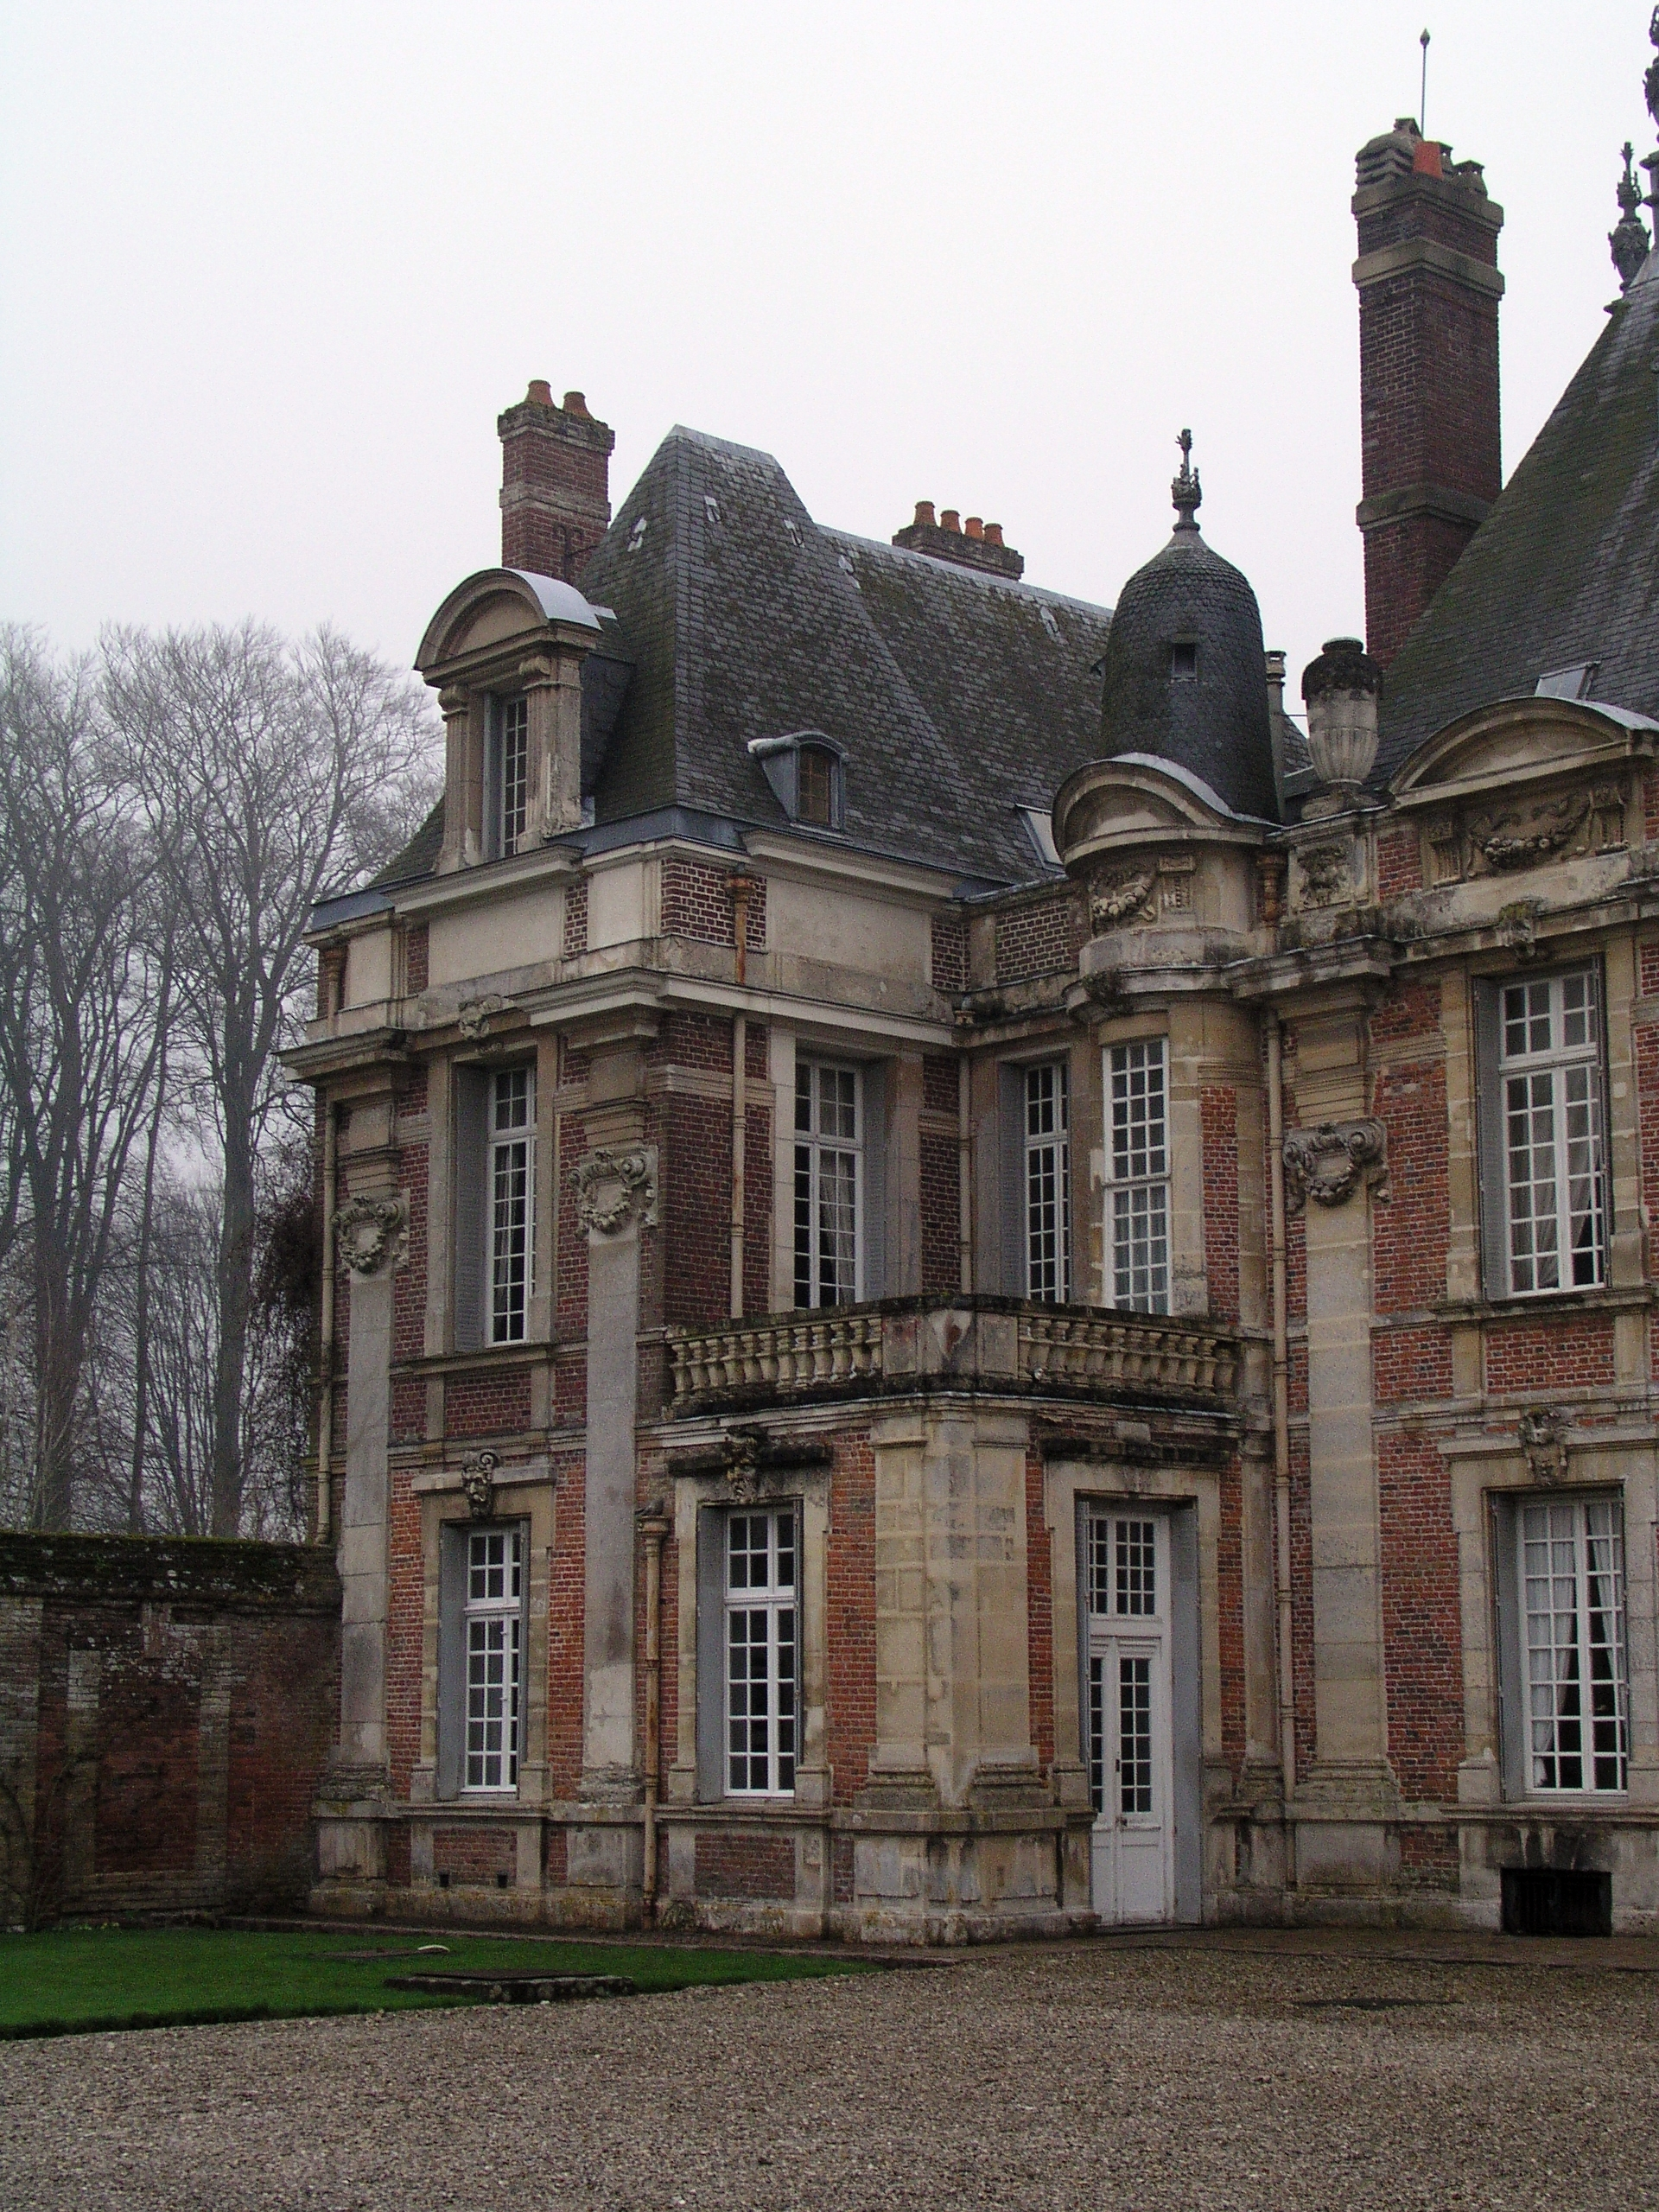 chateau de miromesnil by udochristmann on deviantart. Black Bedroom Furniture Sets. Home Design Ideas